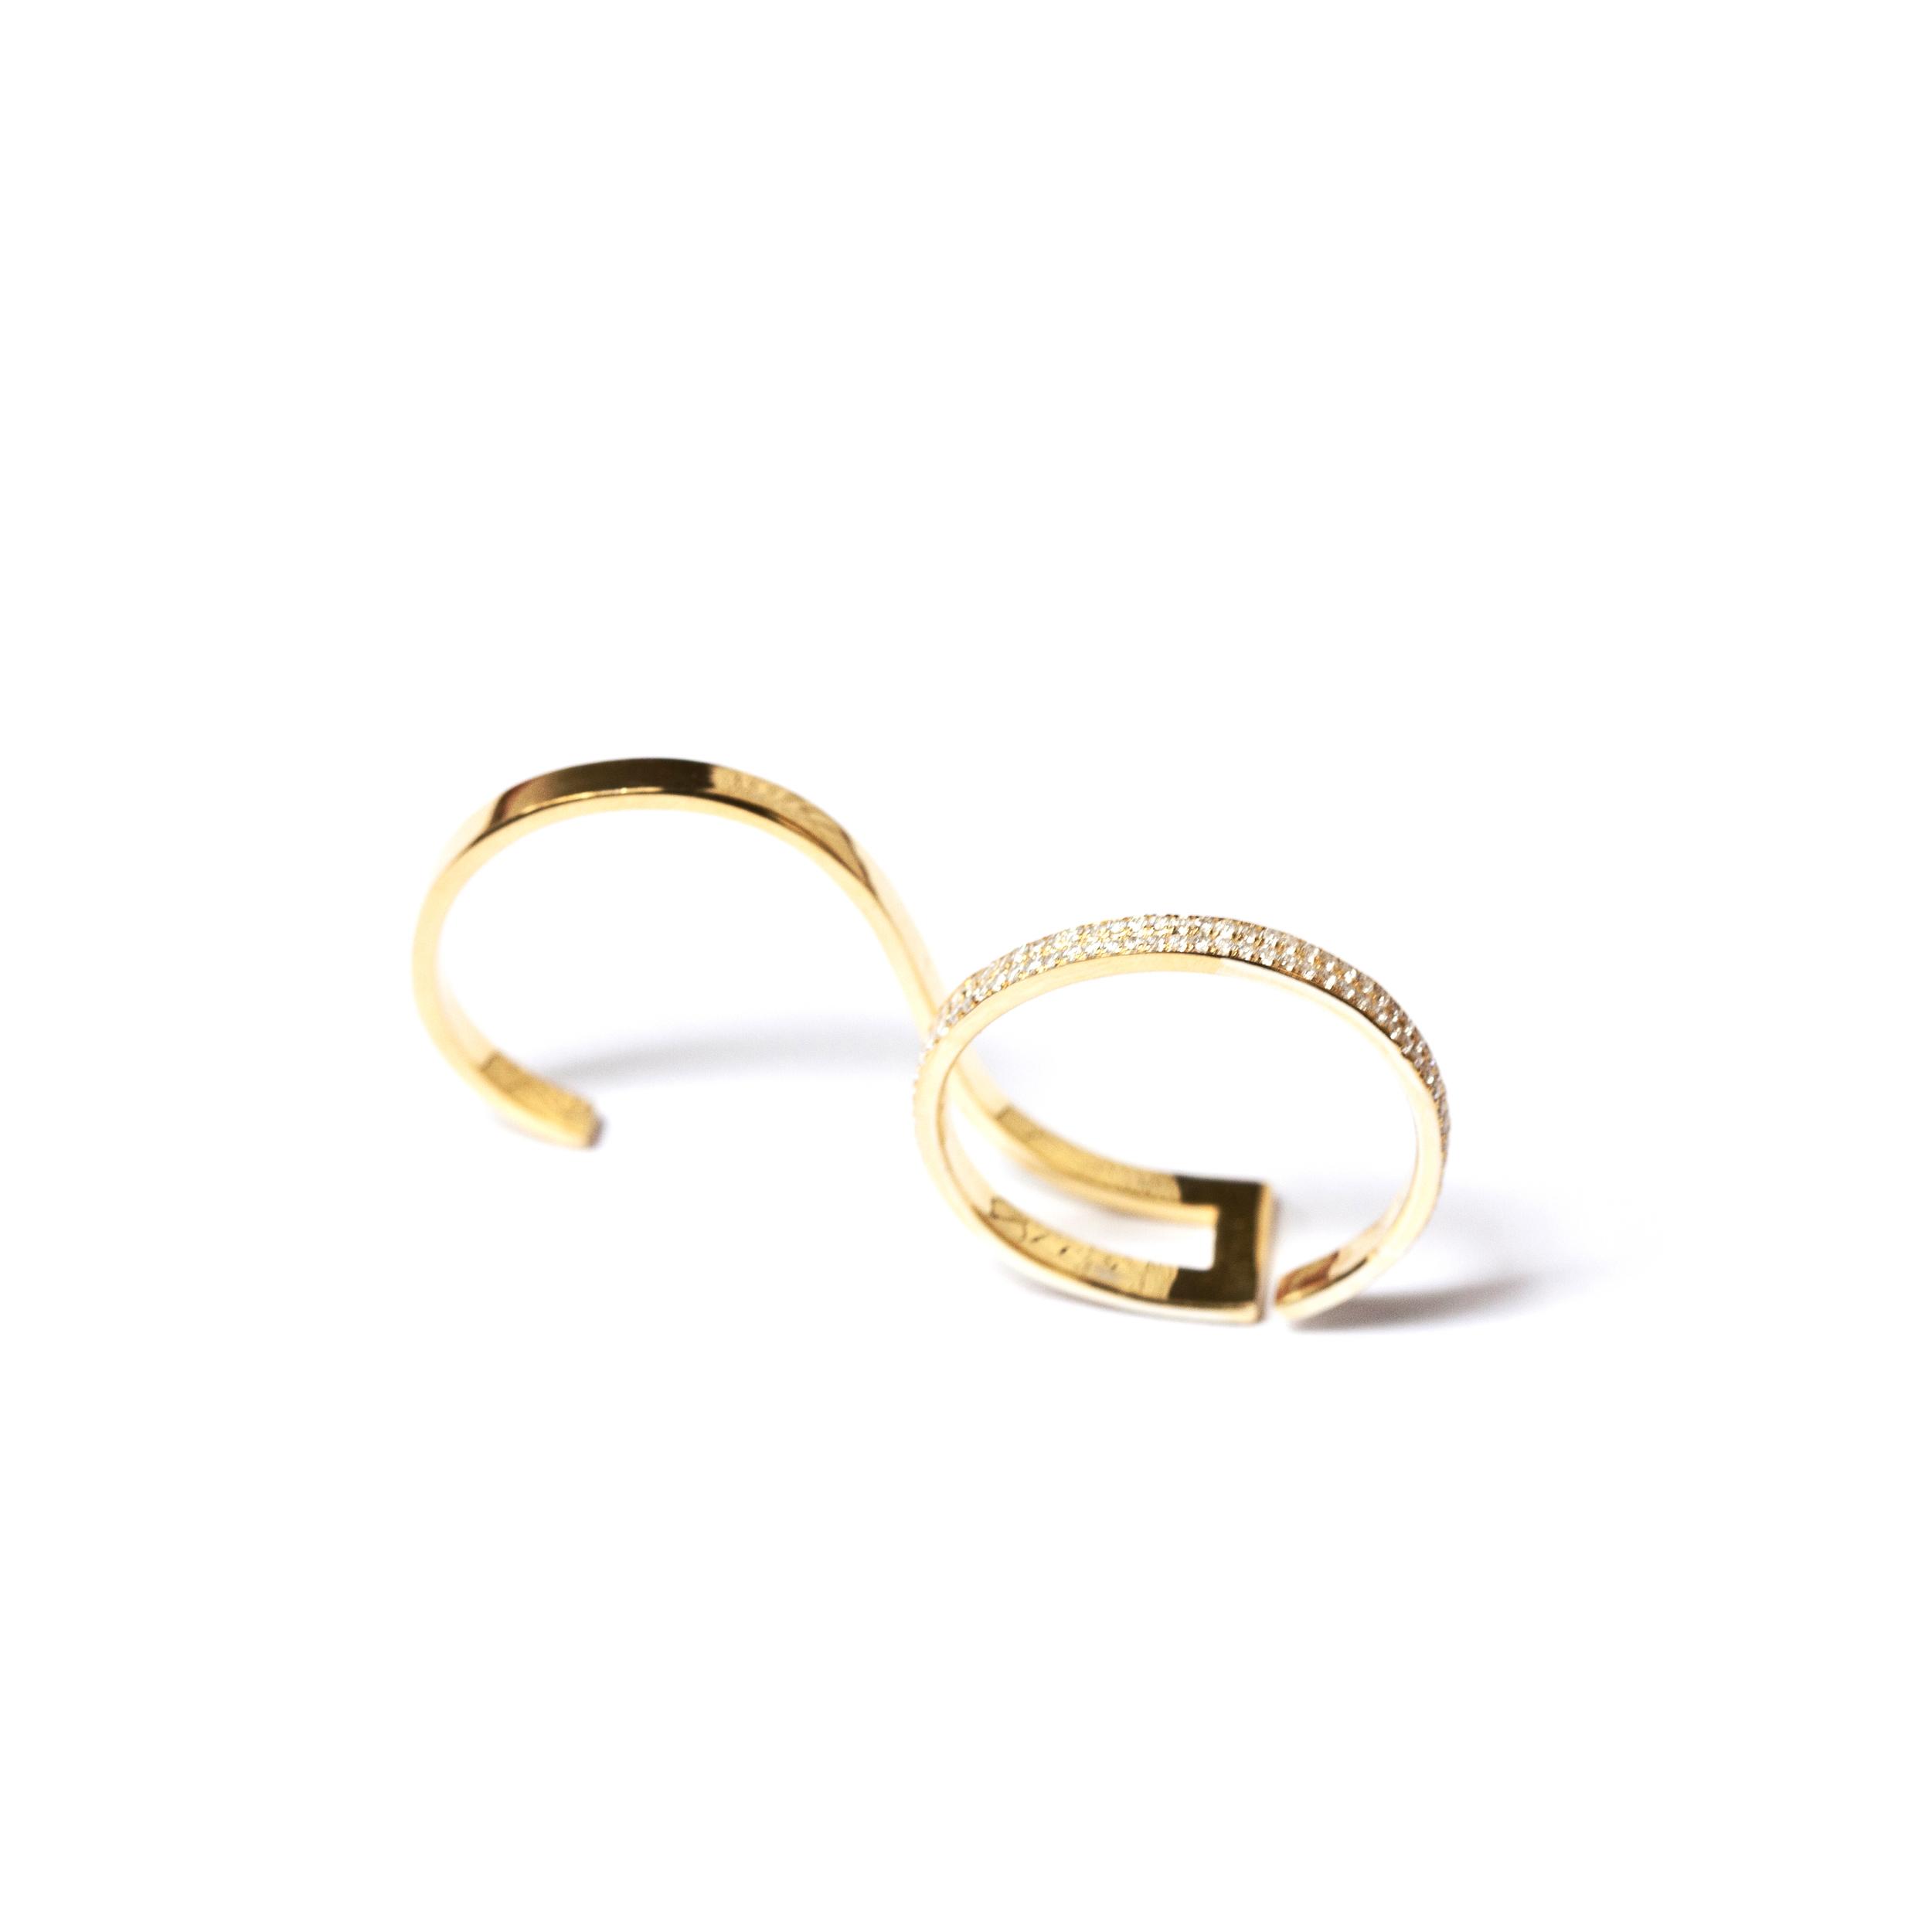 dorry hsu Unfinished line ring with diamonds, HSU.jpeg